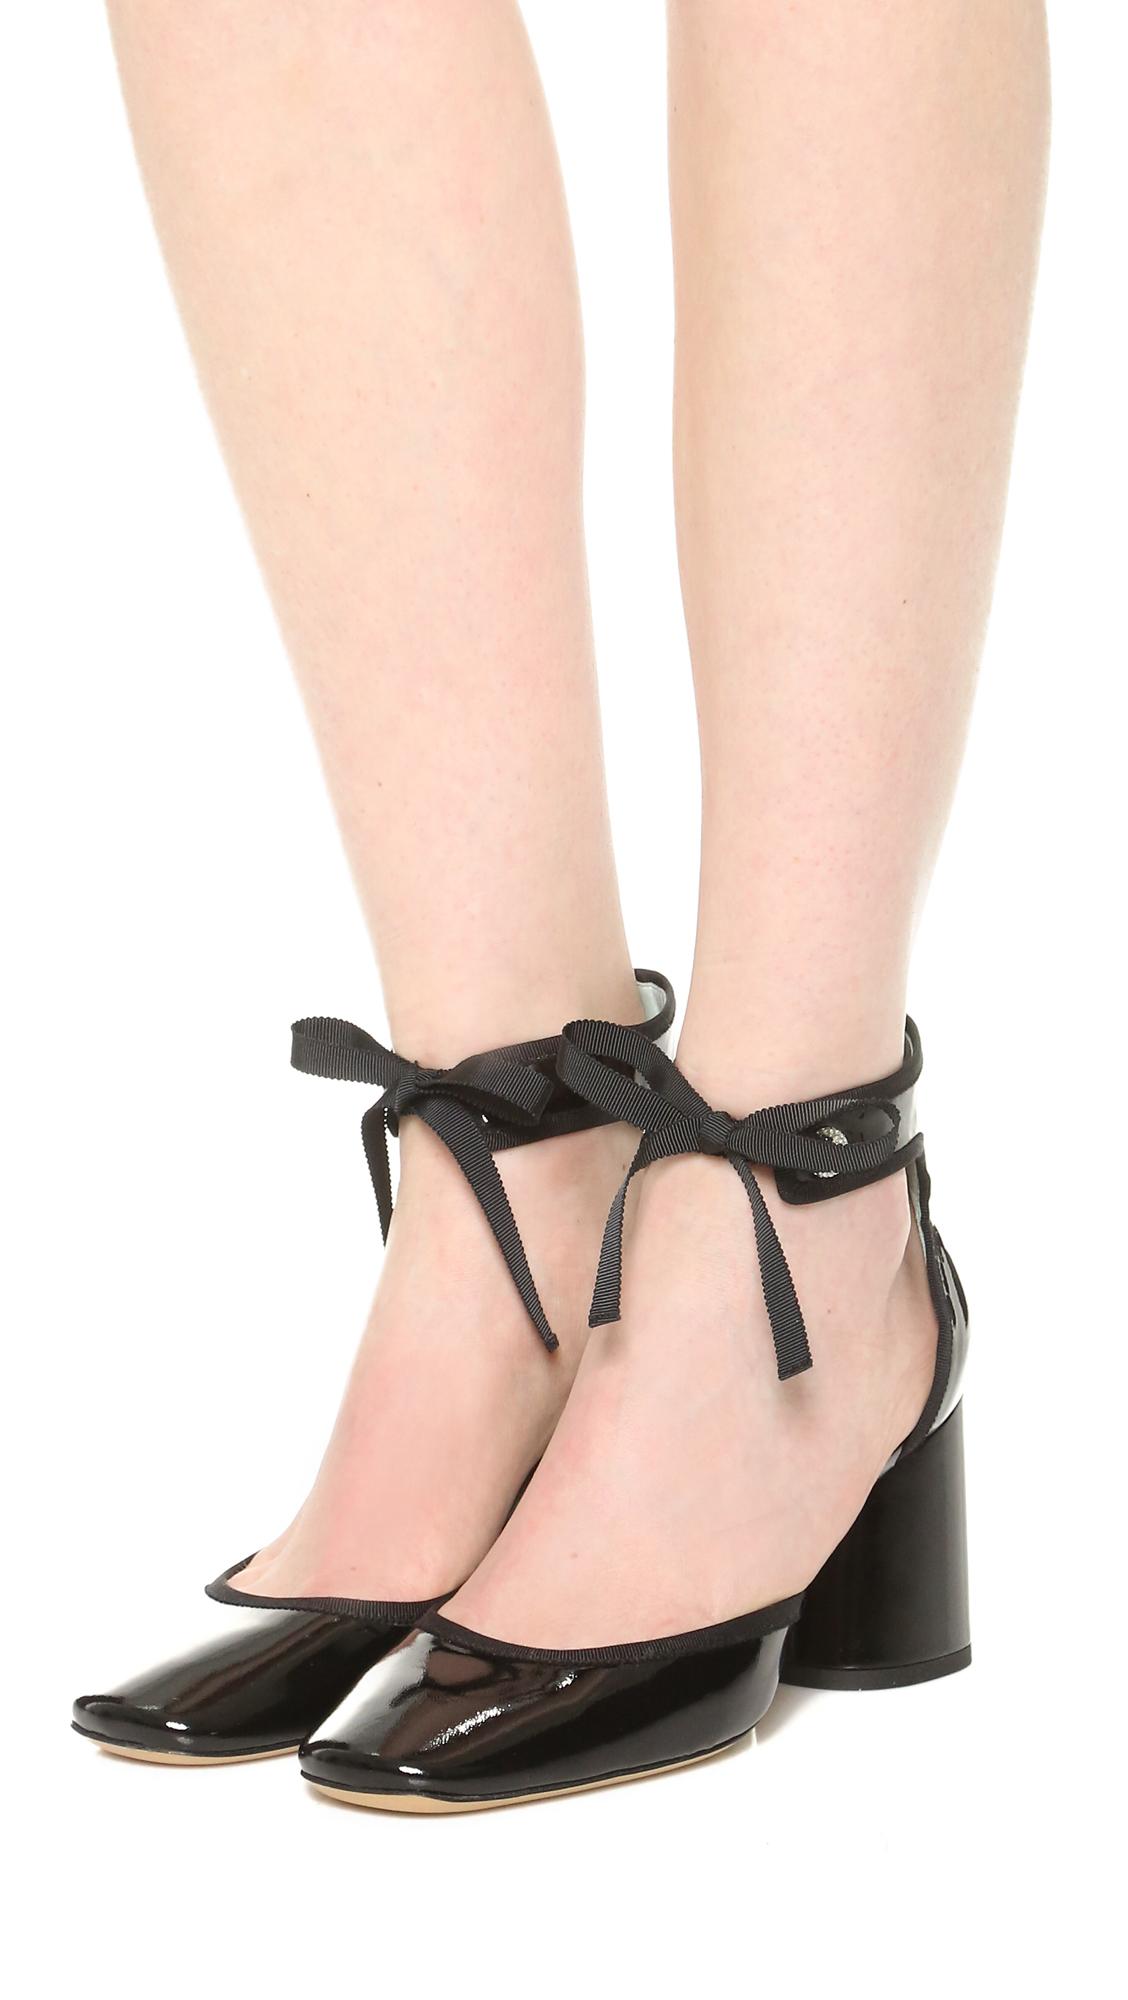 Marc Jacobs Shoes Uk